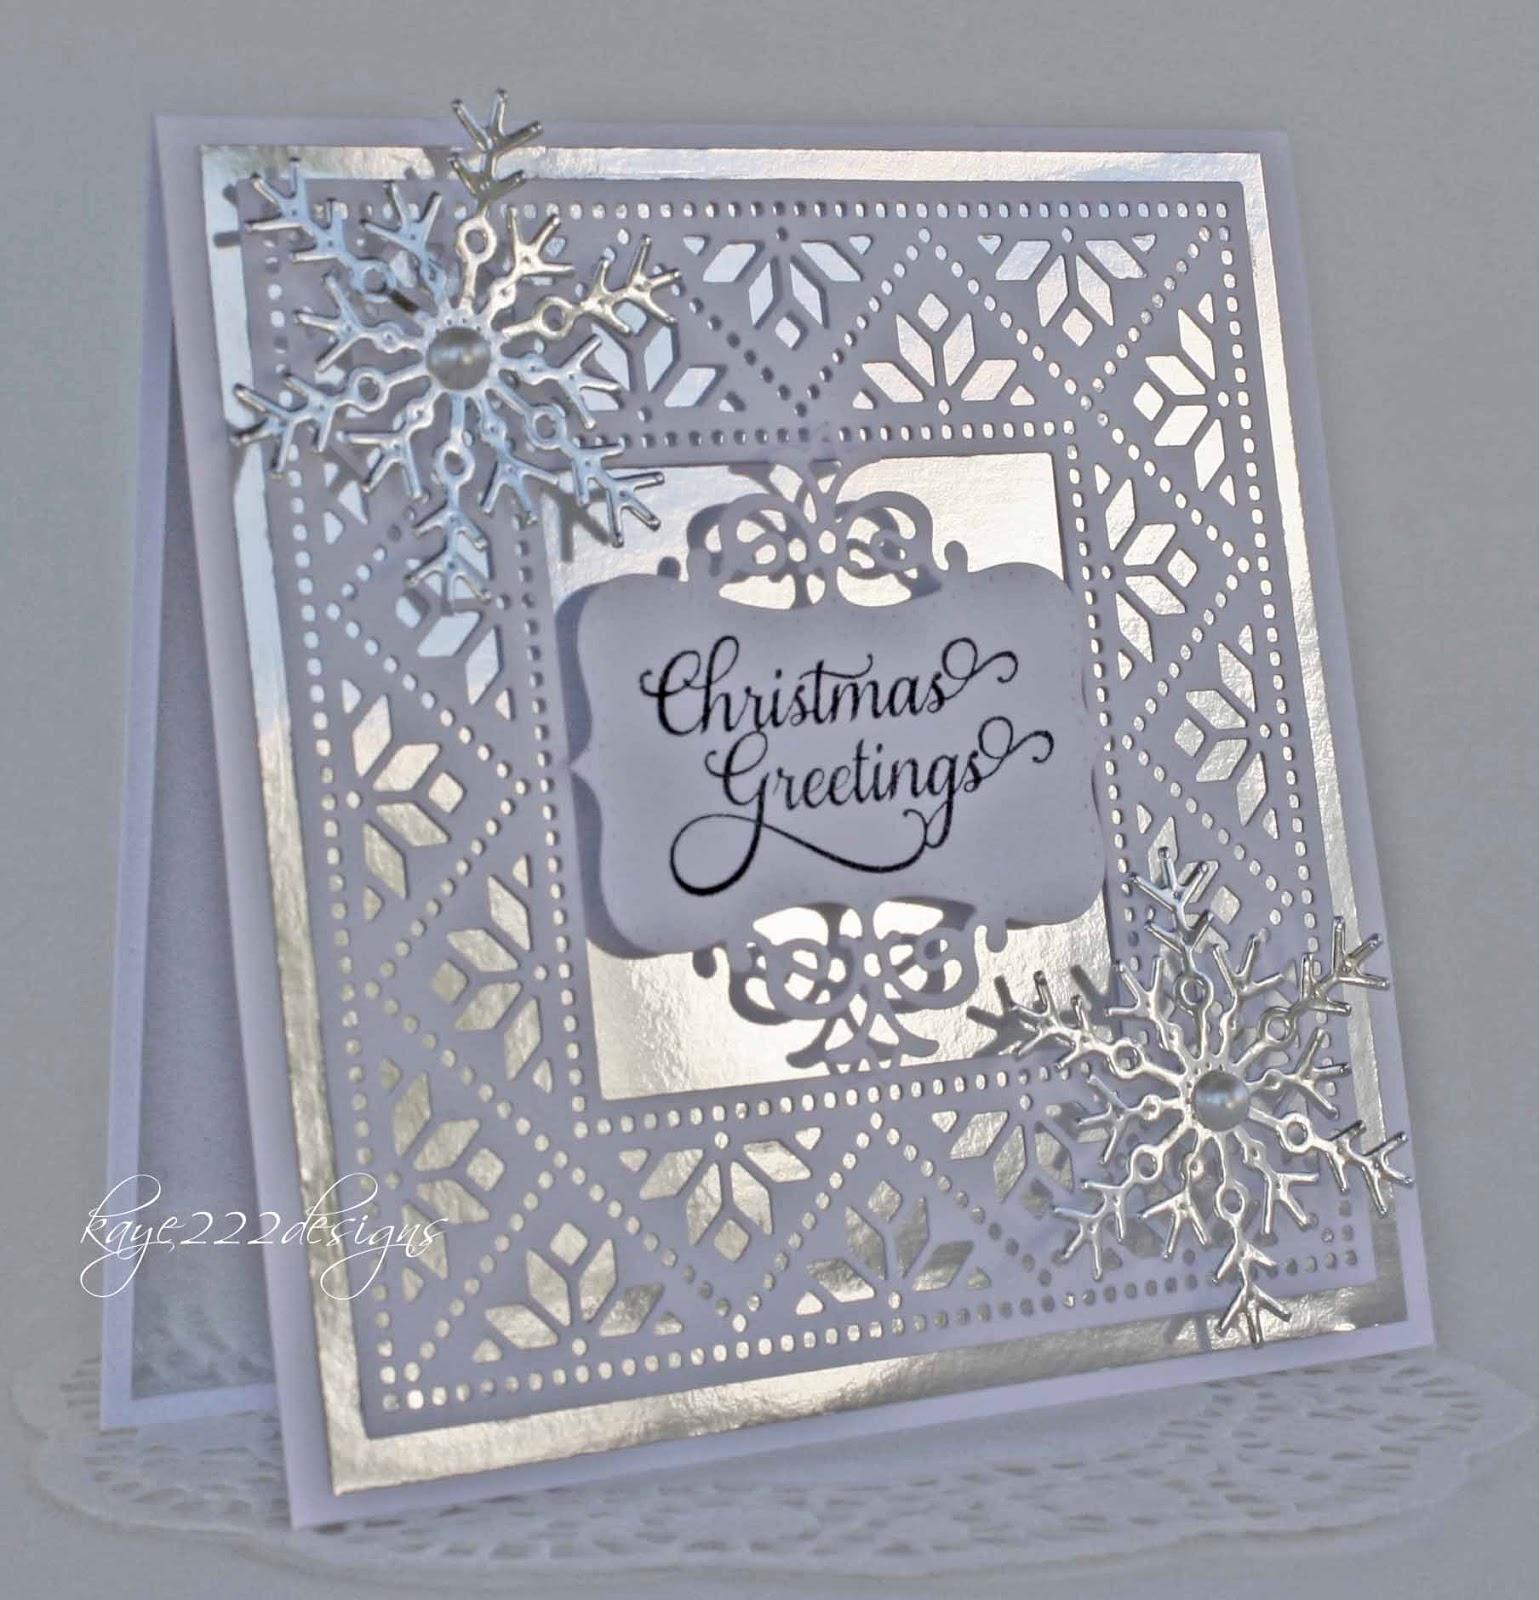 Beyond Beauty Christmas Greetings With Cheery Lynn Designs